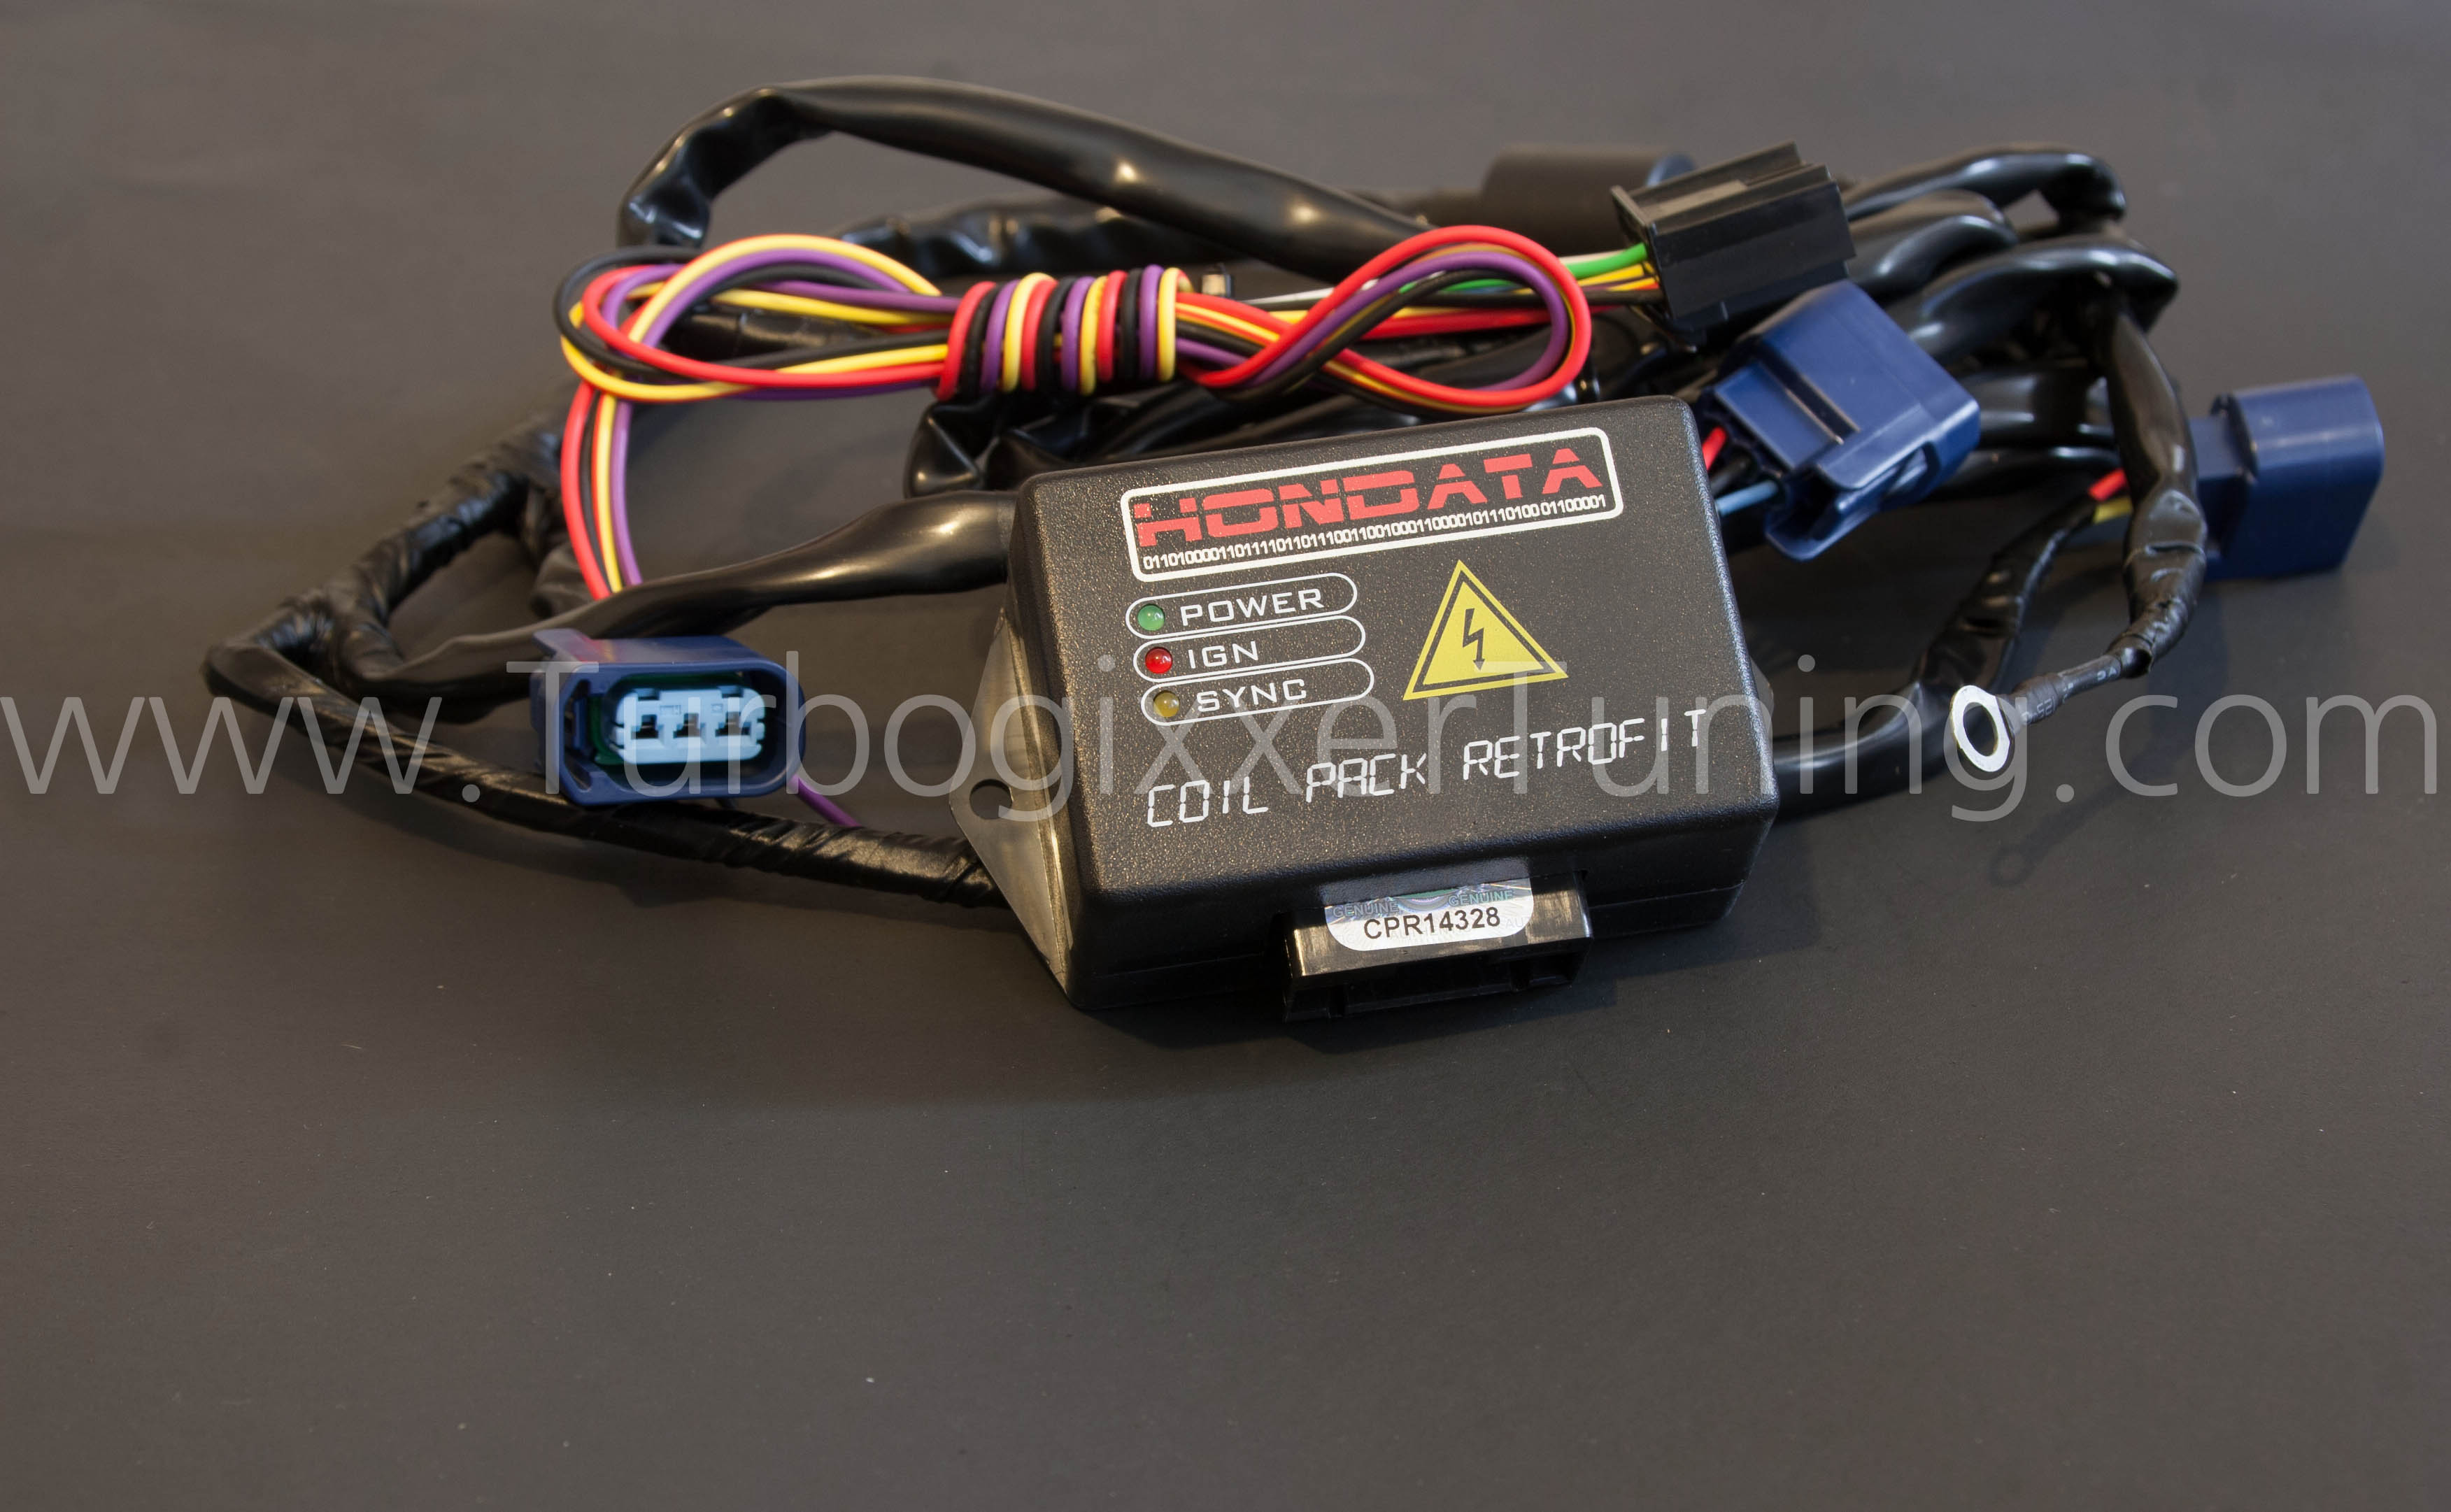 Turbogixxer Tuning :: Hondata :: Hondata Coil Pack Retrofit (CPR) on